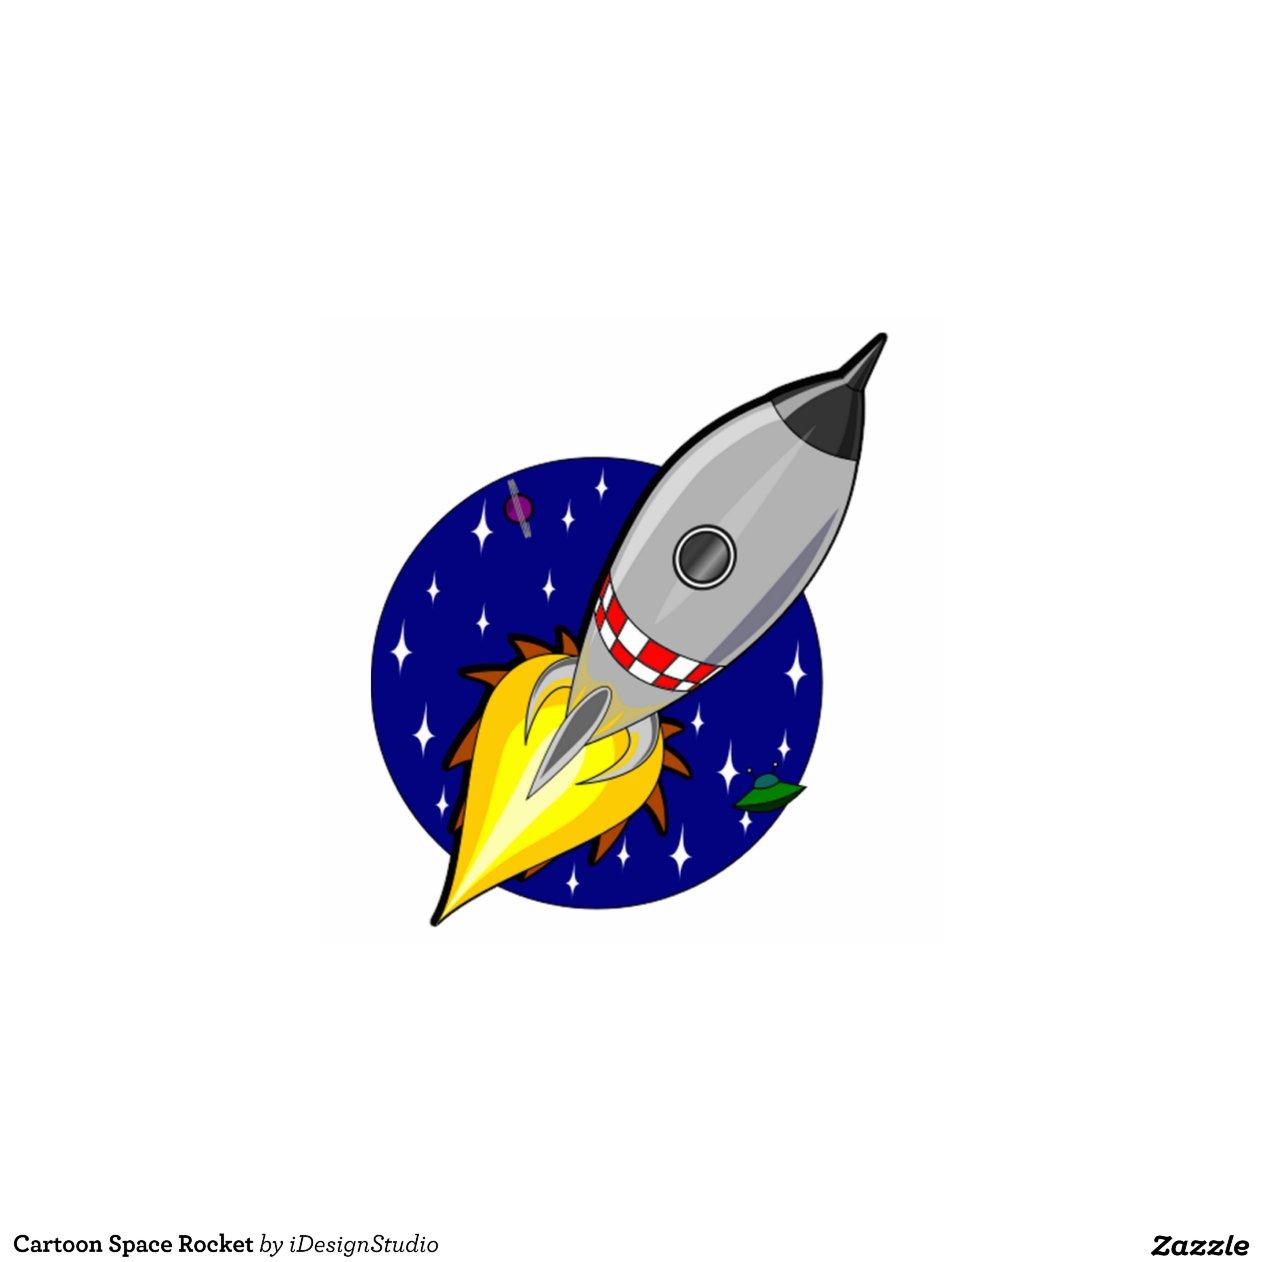 Cartoon Space Rocket Cut Out